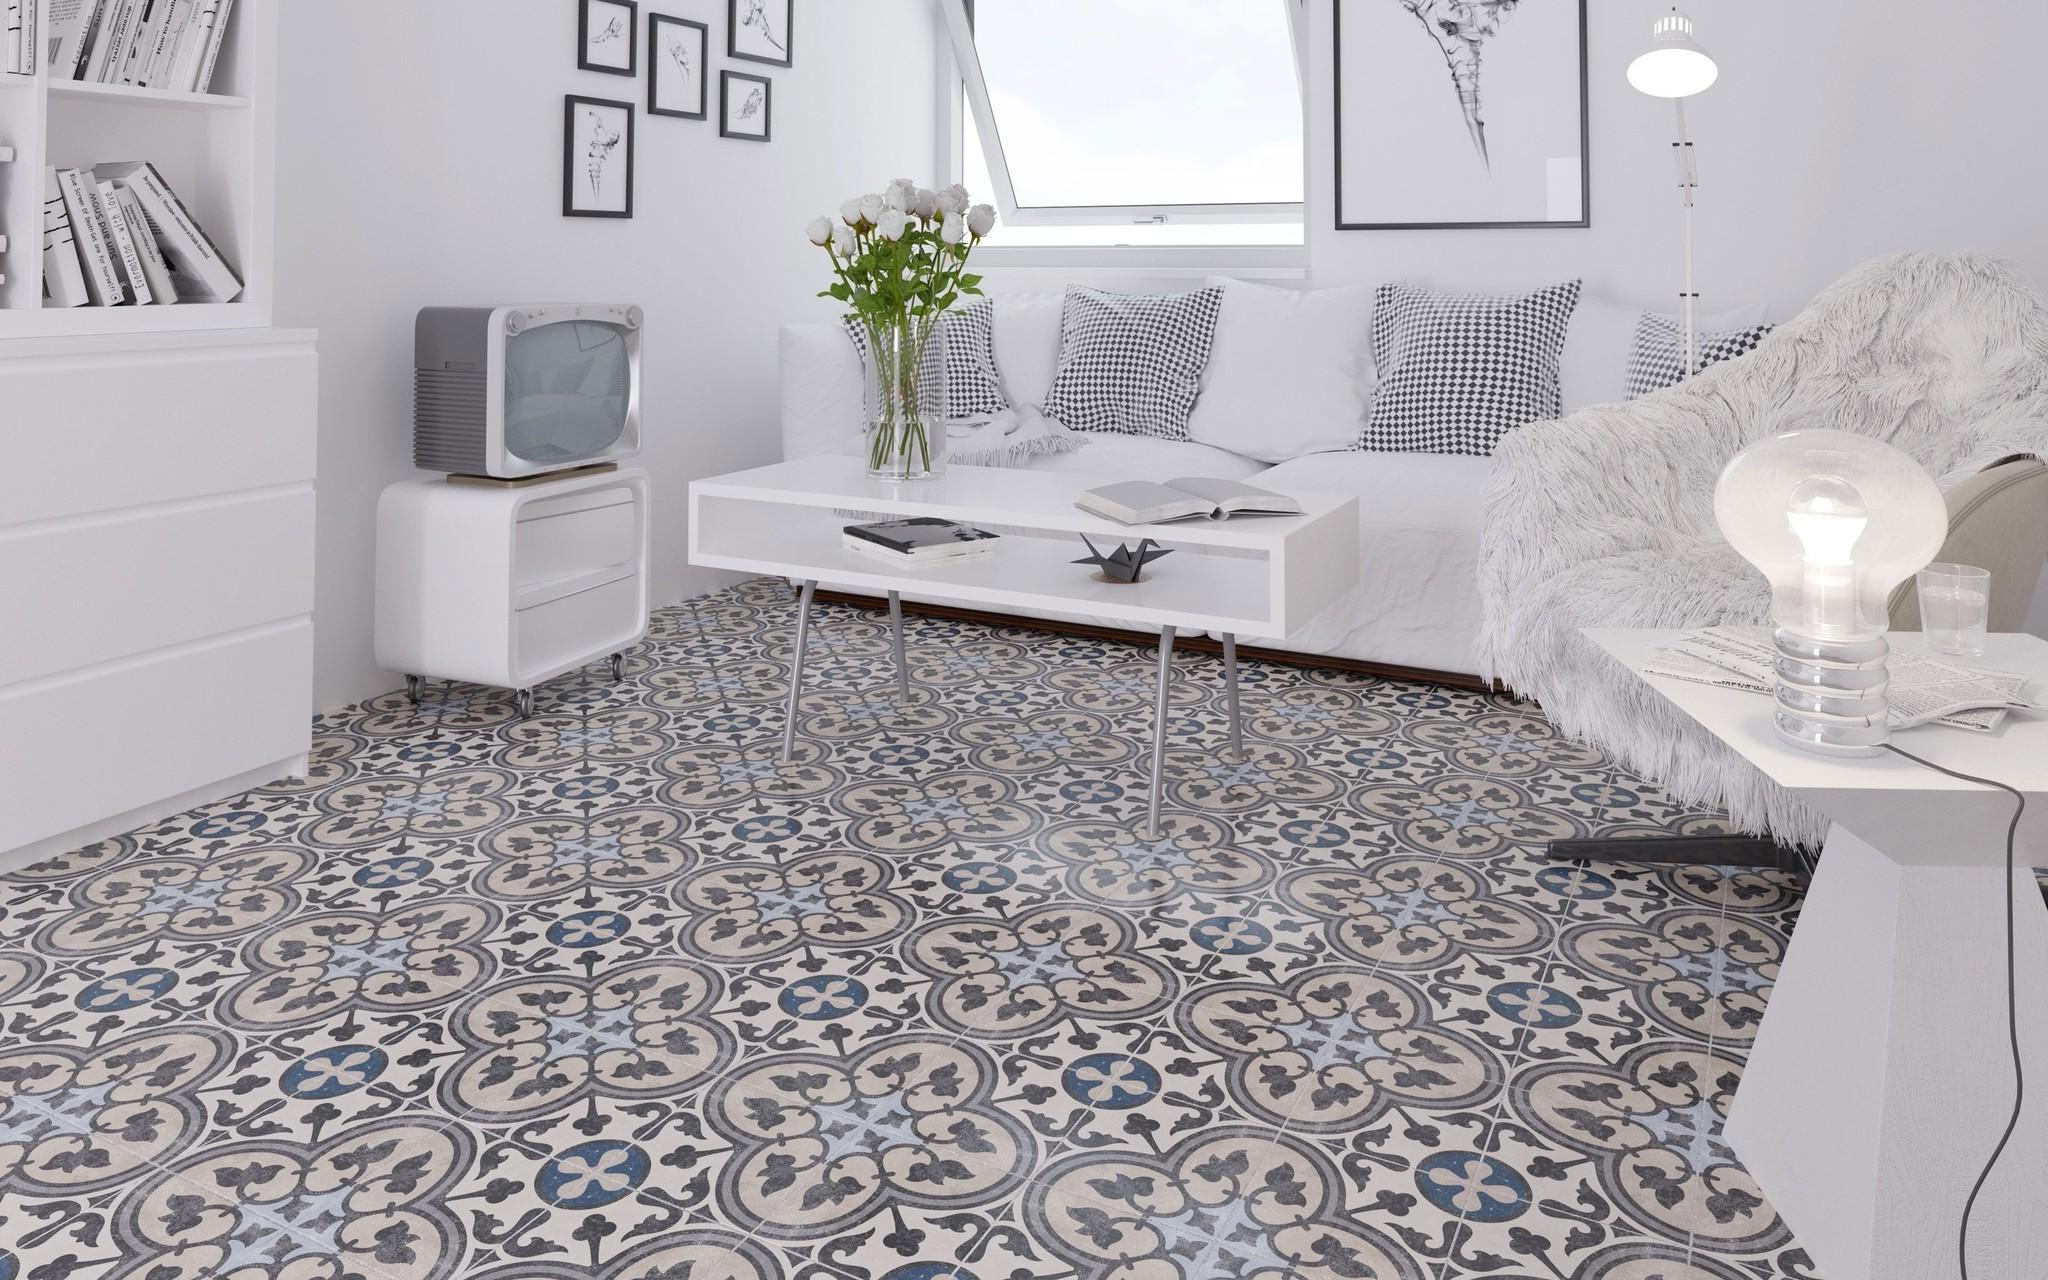 Victorian Faded Royal Pattern Floor, Victorian Floor Tiles Bathroom